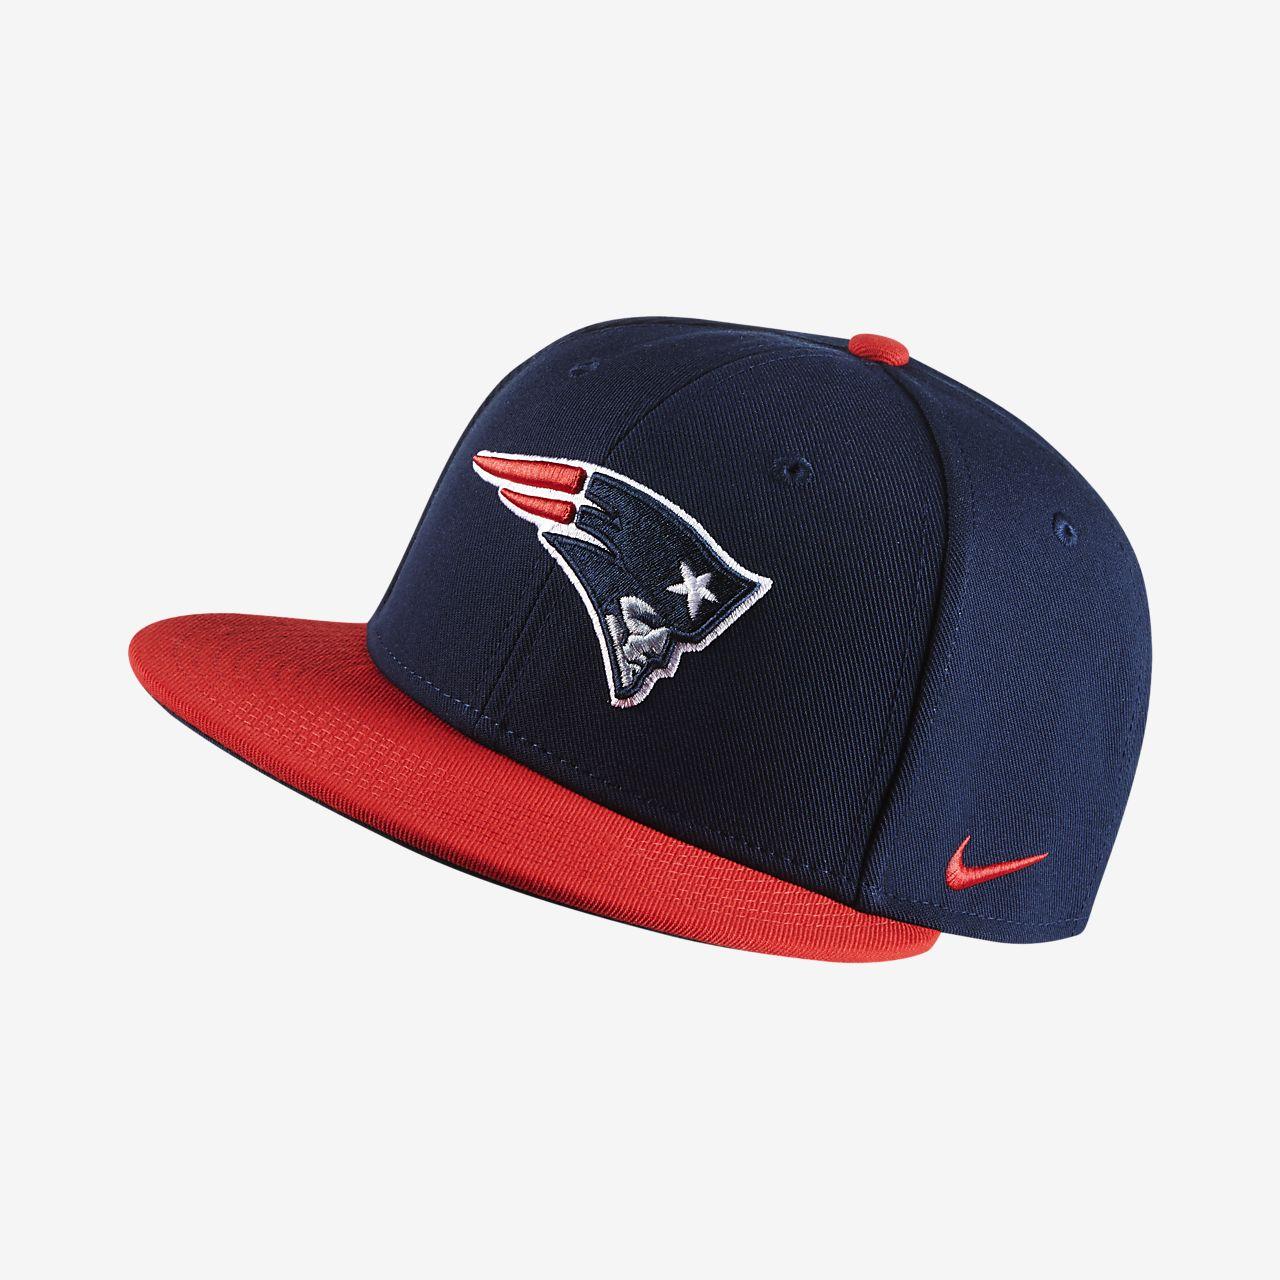 c4761b4afd2c6 Gorro ajustable Nike Everyday True (NFL Patriots). Nike.com CL